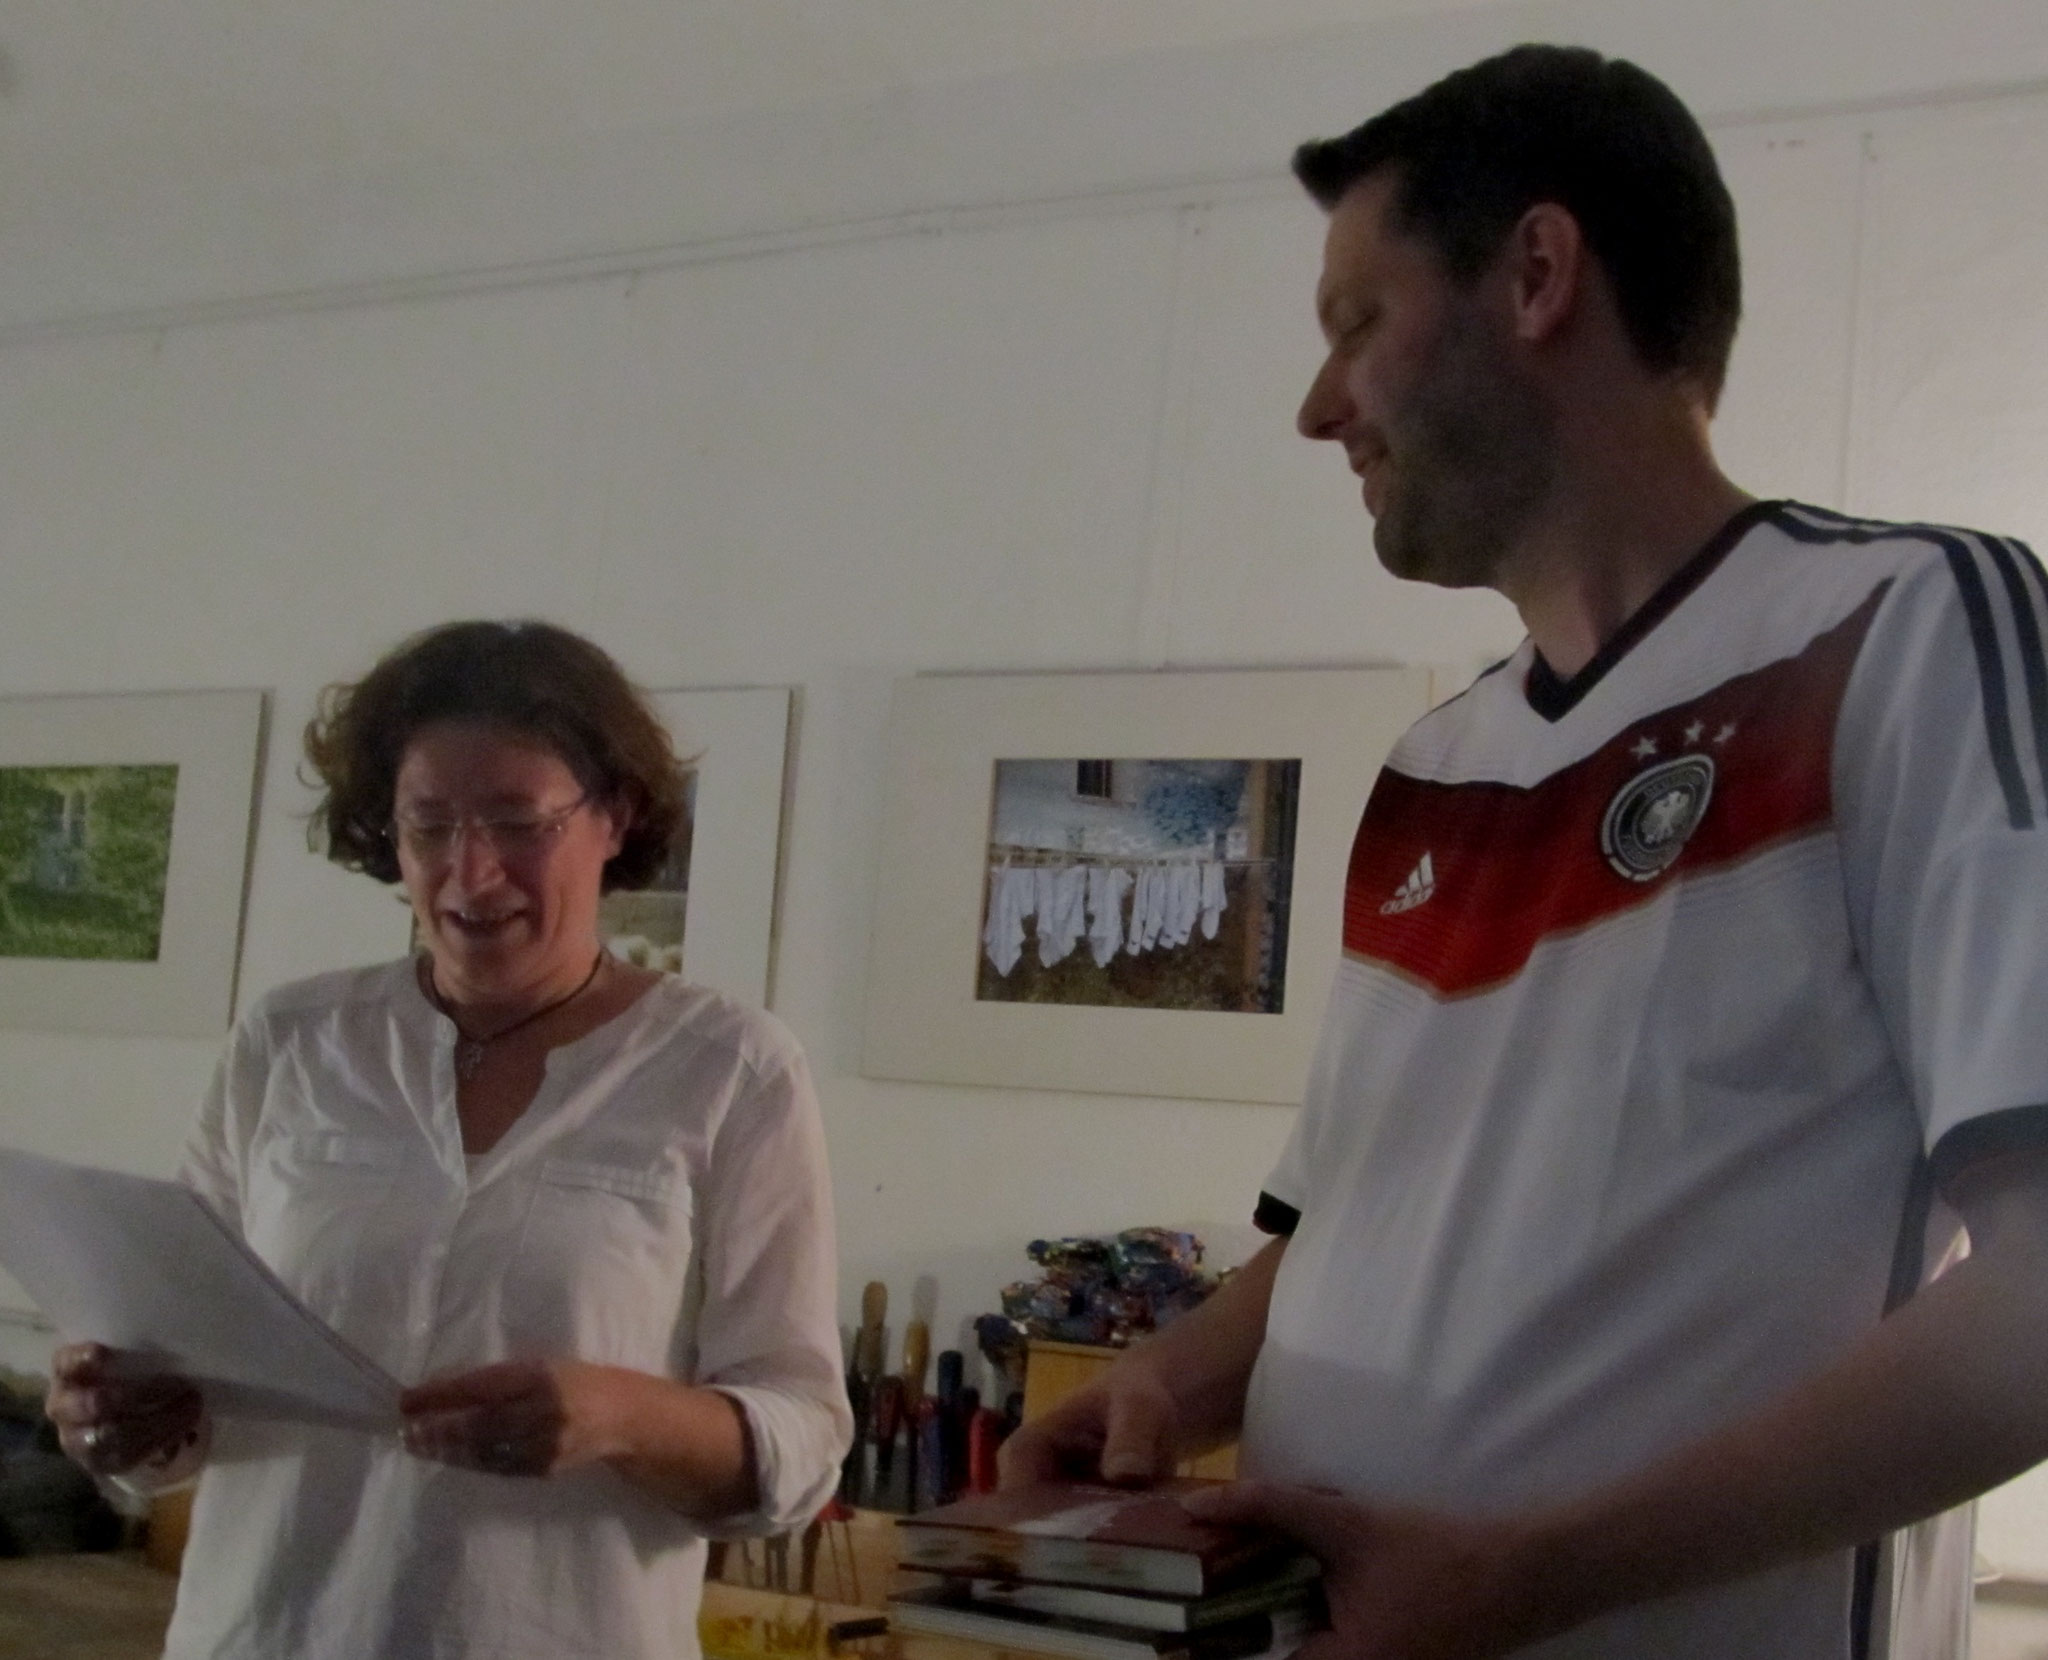 Gisela Weinhändler & Jan-Eike Hornauer